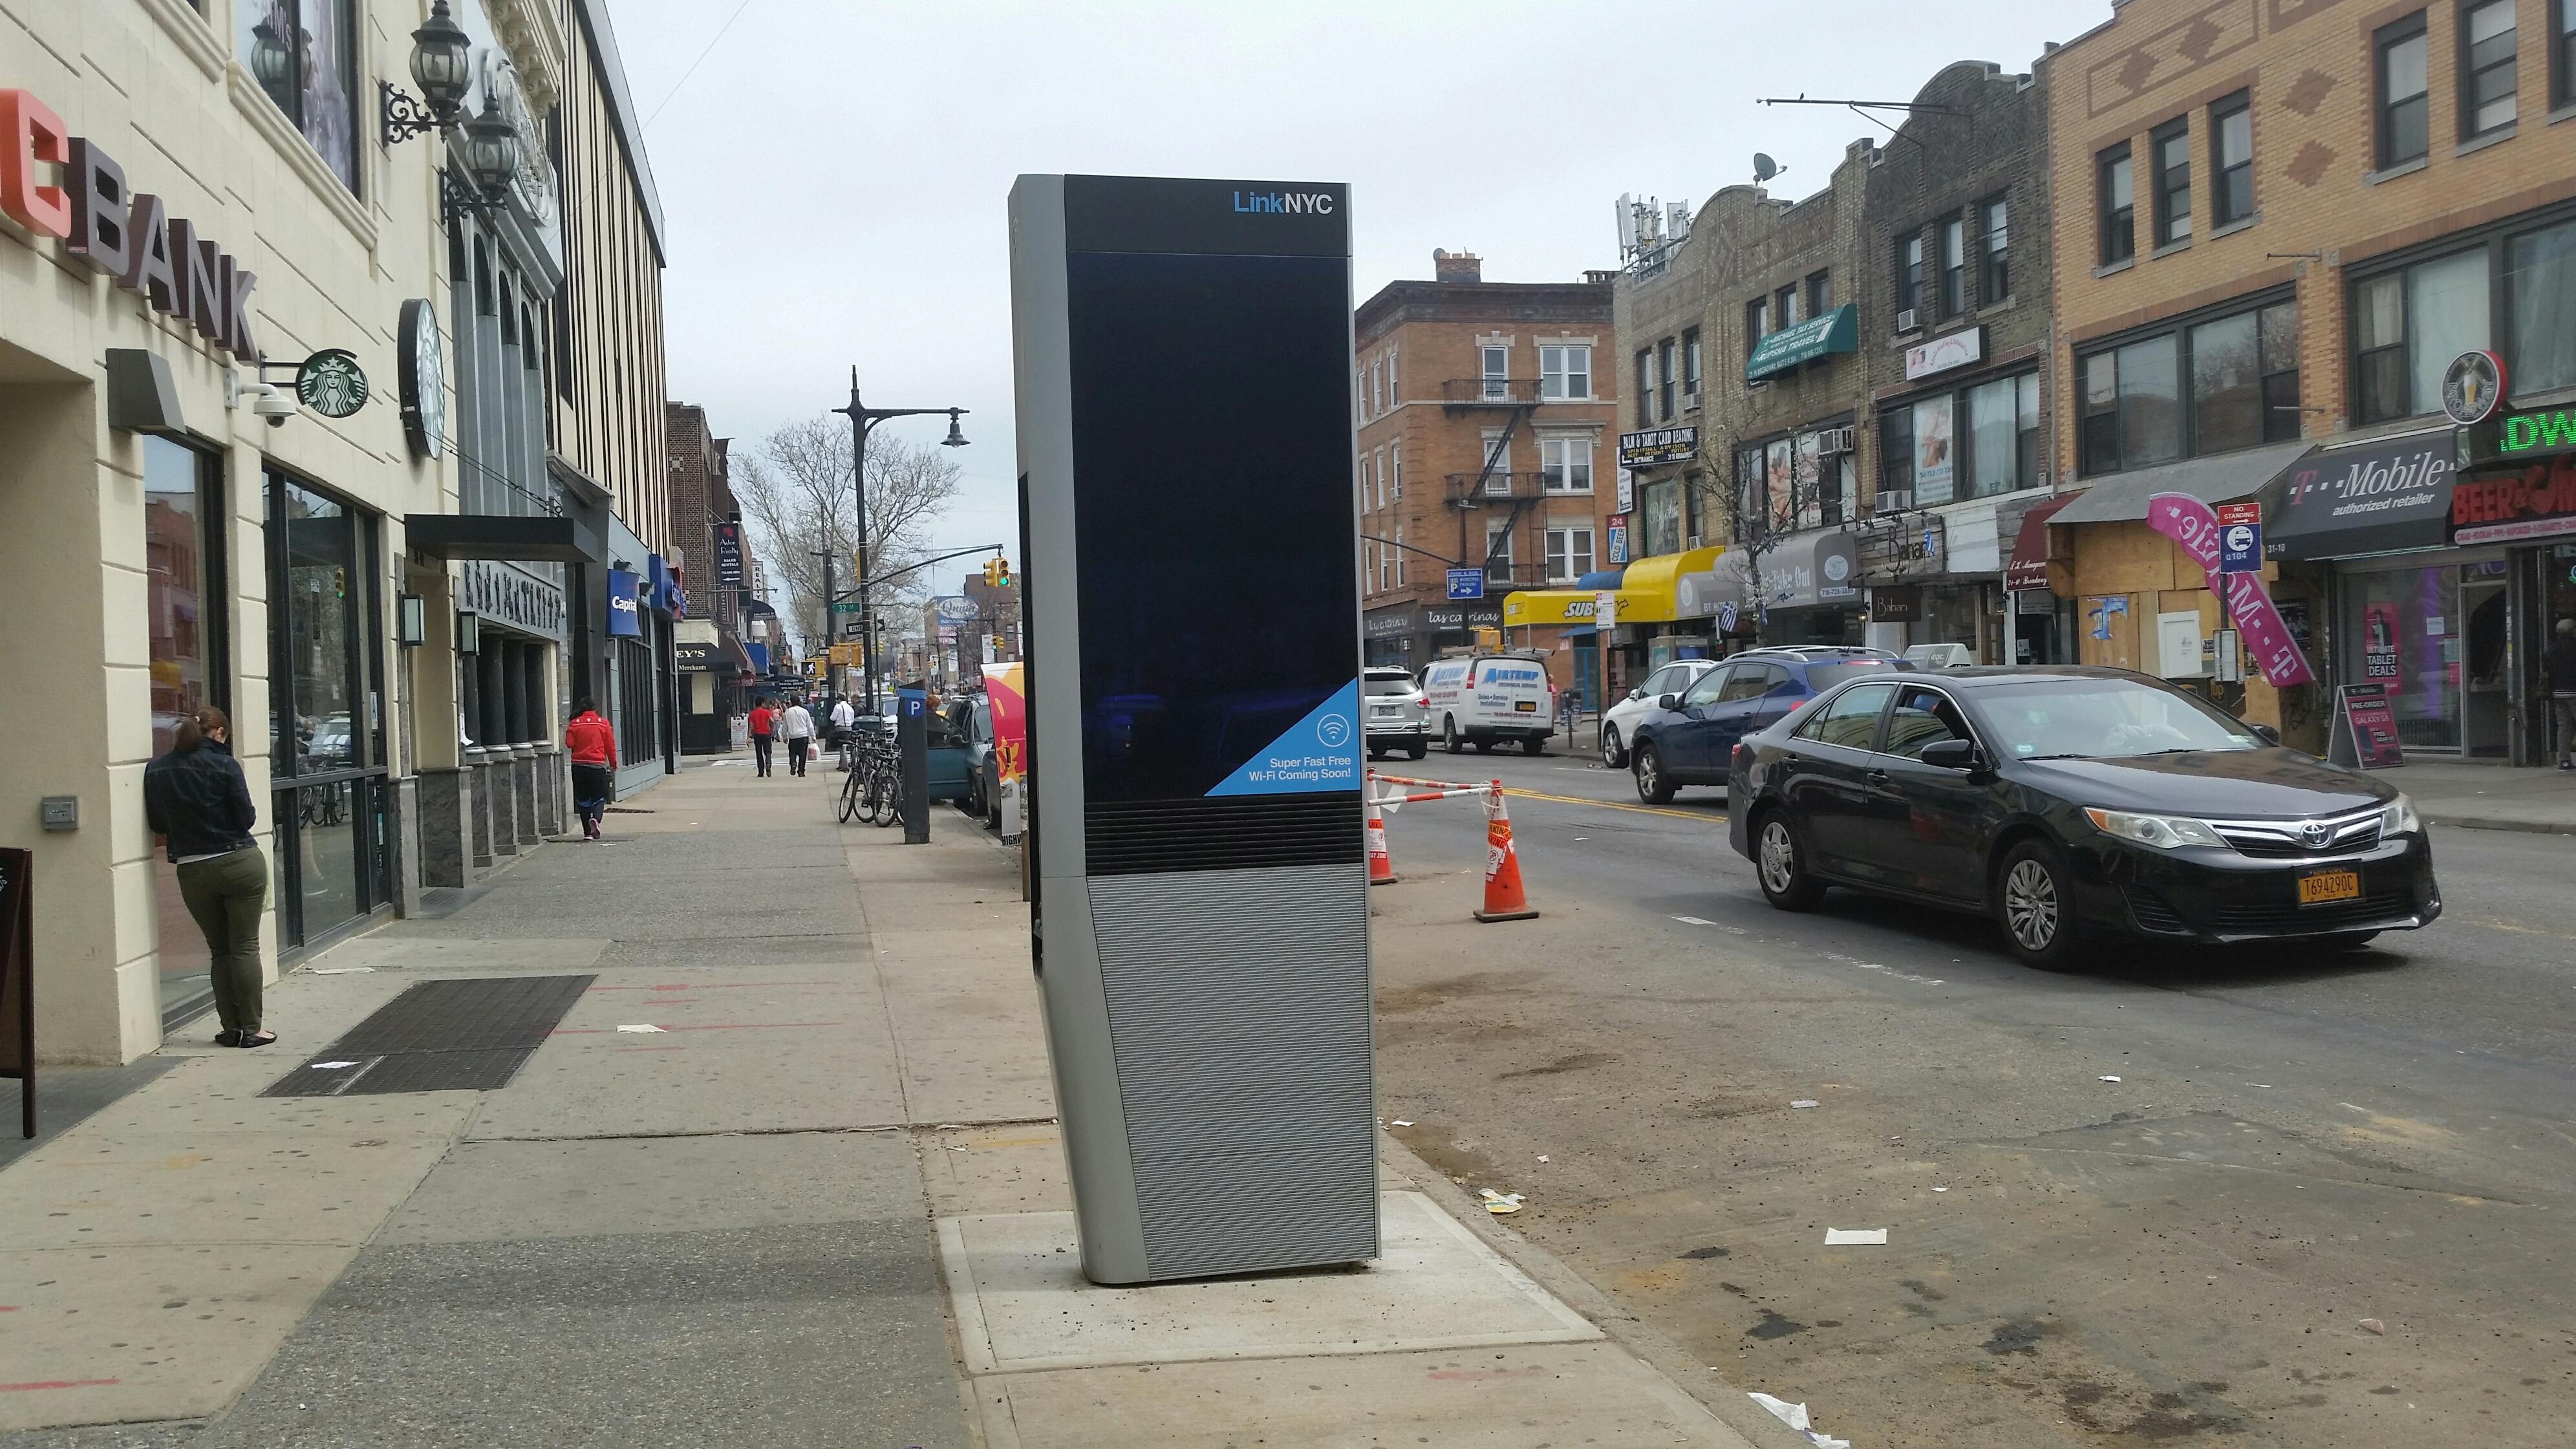 LINK NYC Kiosks Seen in Astoria